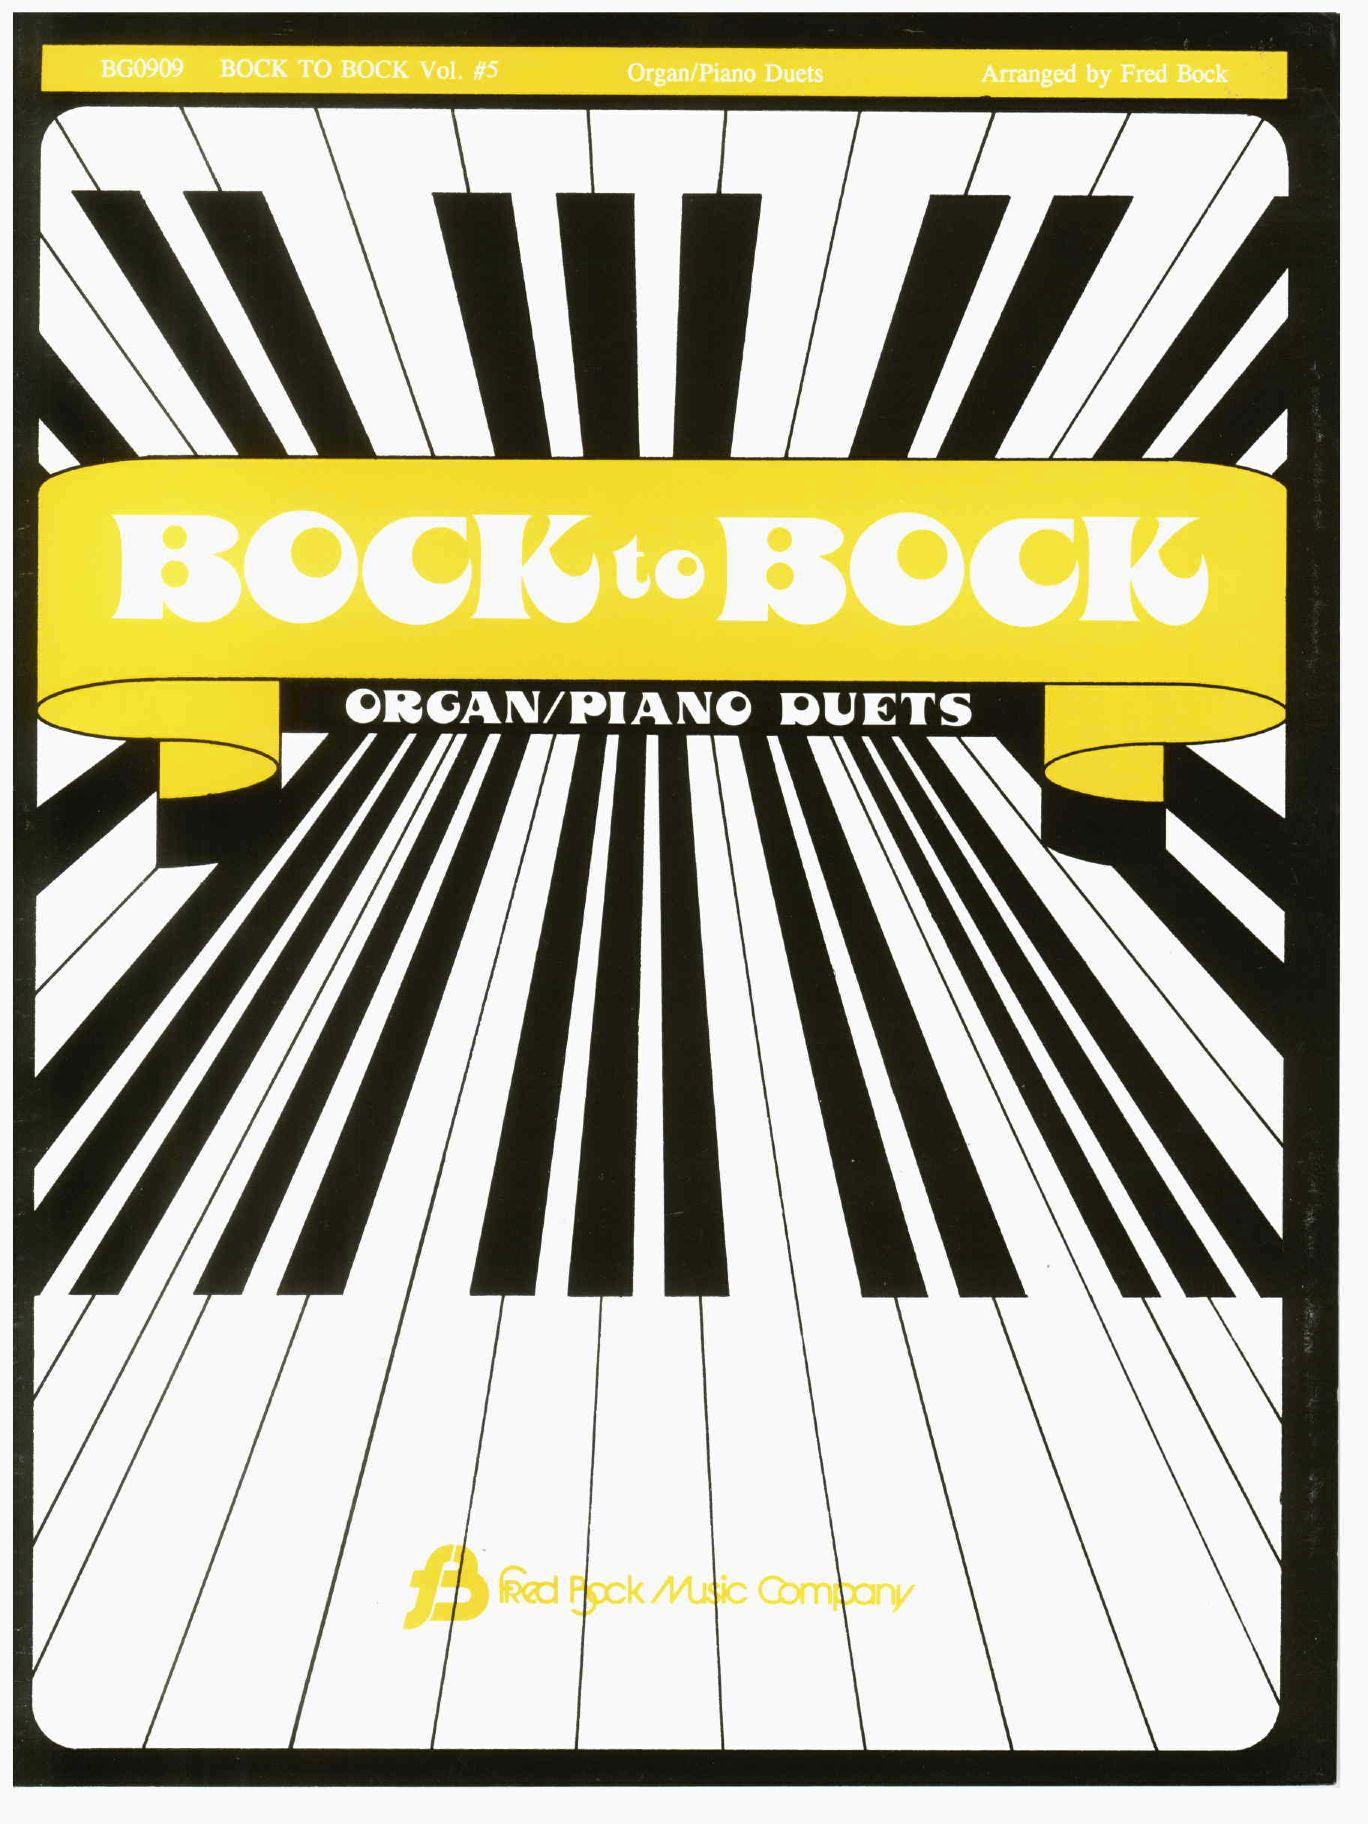 Bock To Bock #5